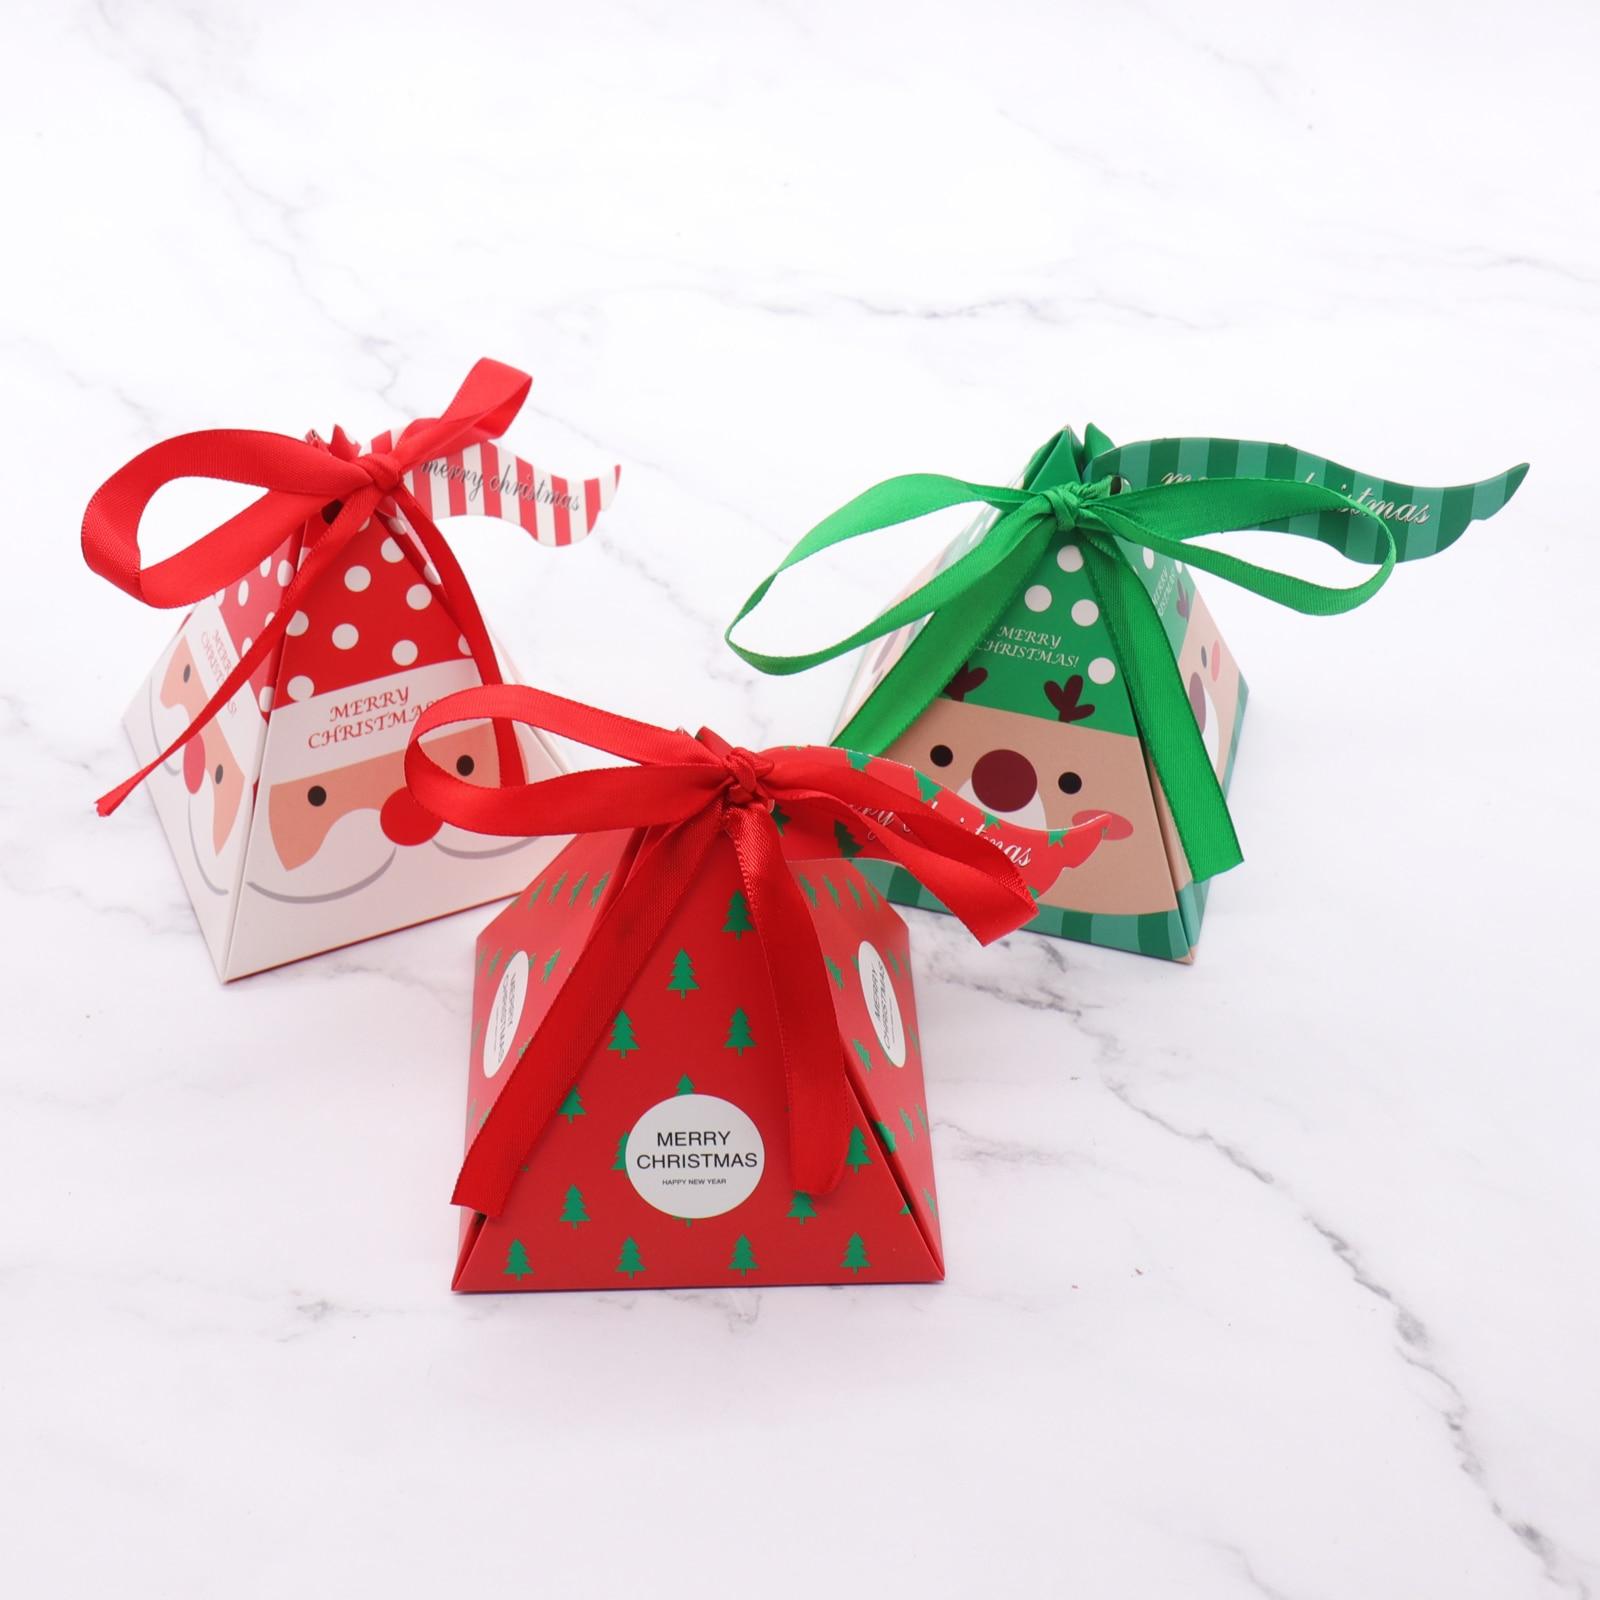 7.5x7.5x9.5cm 10 PCS/Set Merry Christmas Candy Box Bag Christmas Tree Paper  Santa Claus Gift Box Pyramid Party Chocolate Box